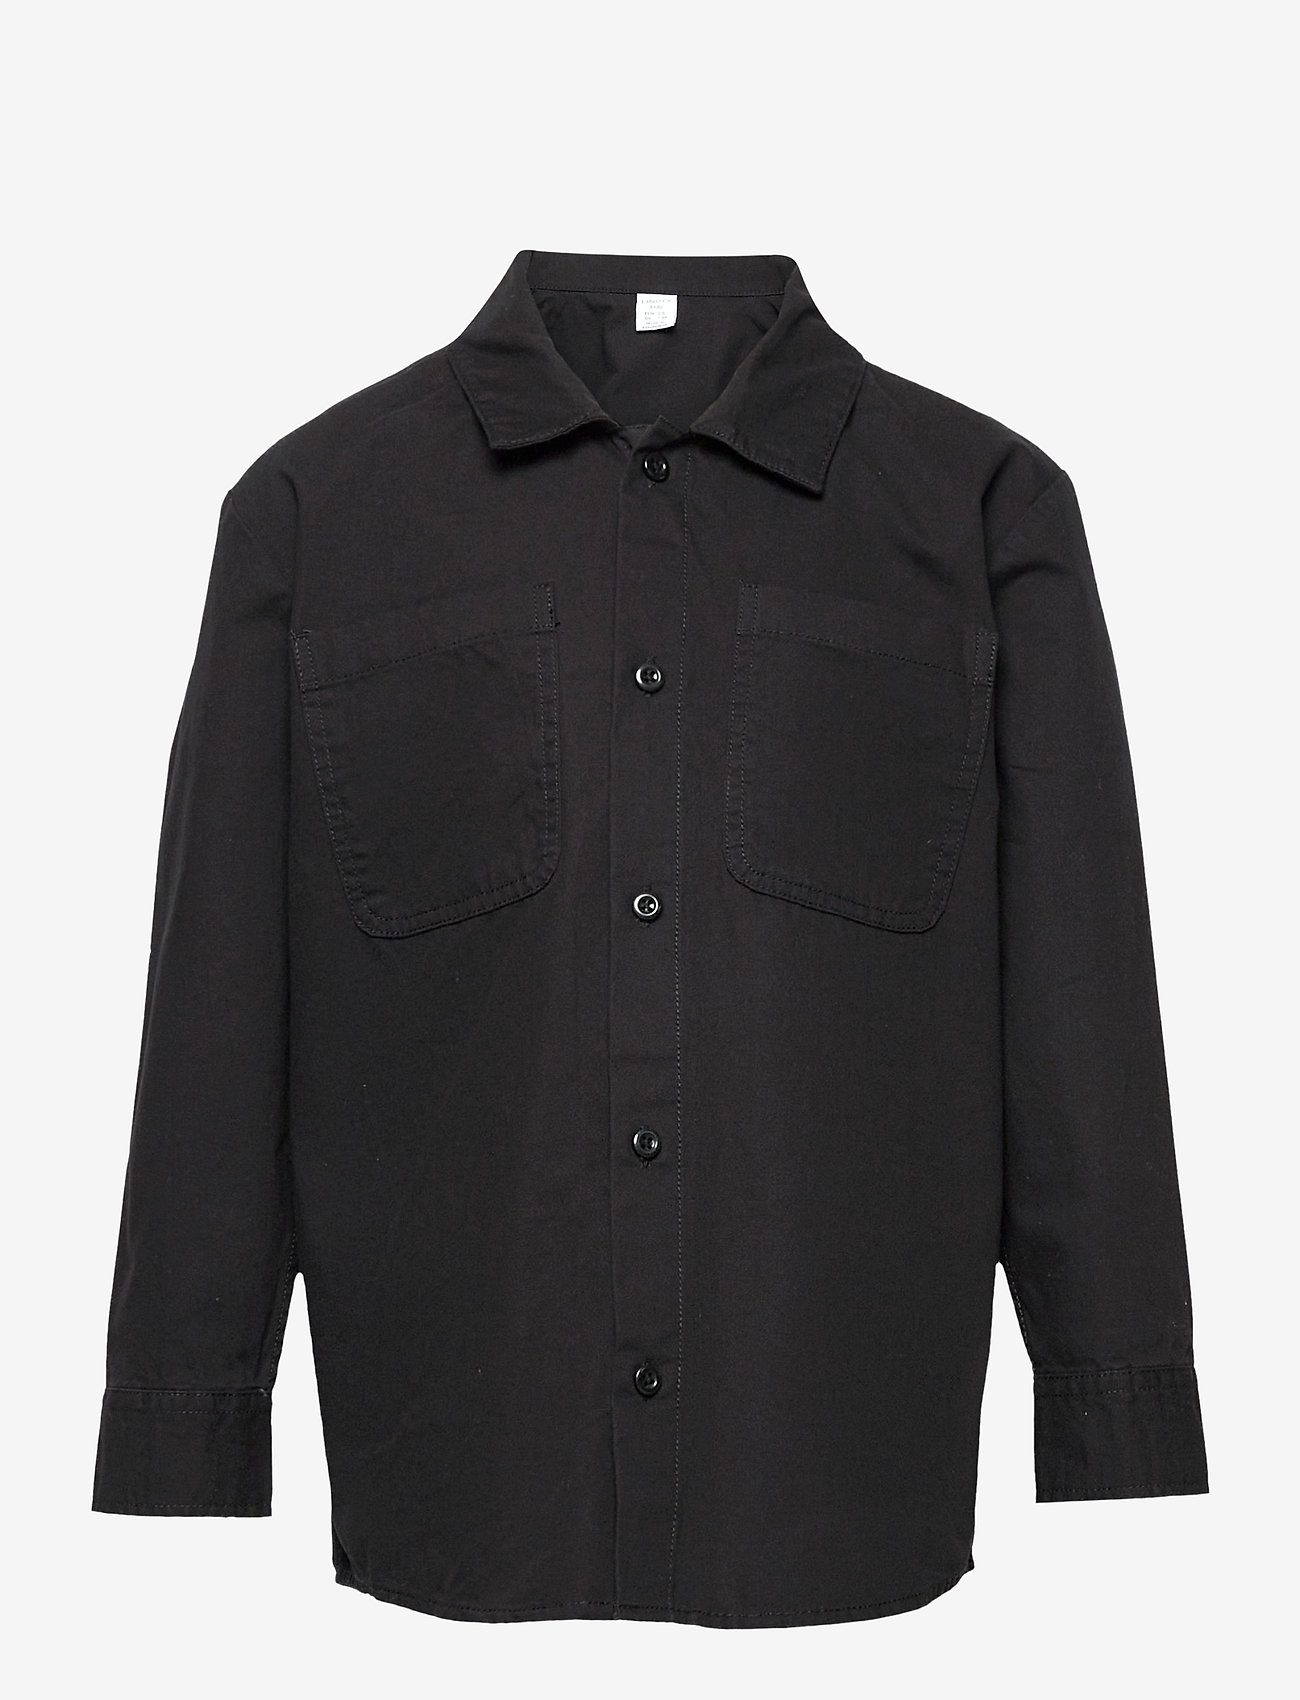 Lindex - Shirt overshirt worker - shirts - black - 0